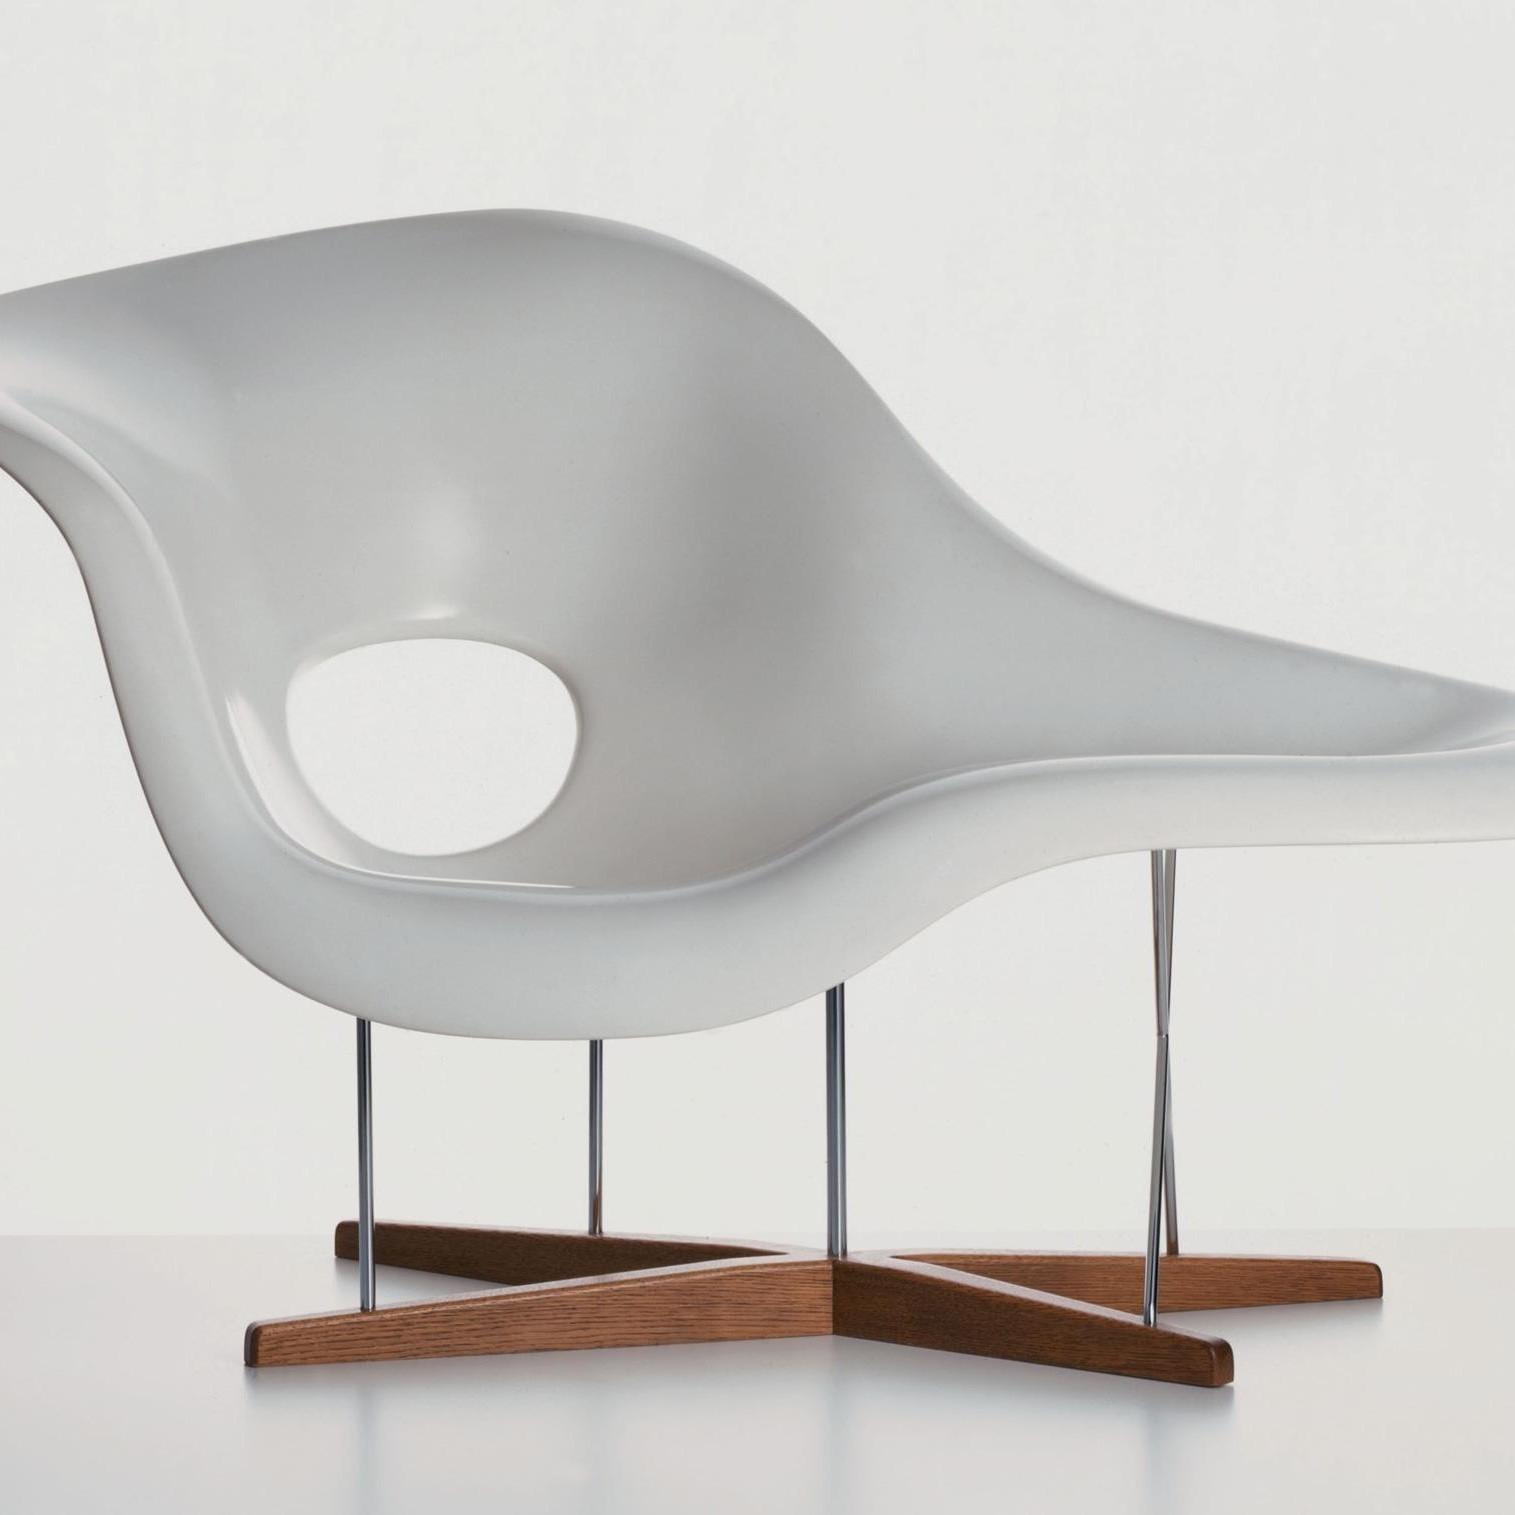 vitra la chaise eames chaise longue ambientedirect. Black Bedroom Furniture Sets. Home Design Ideas